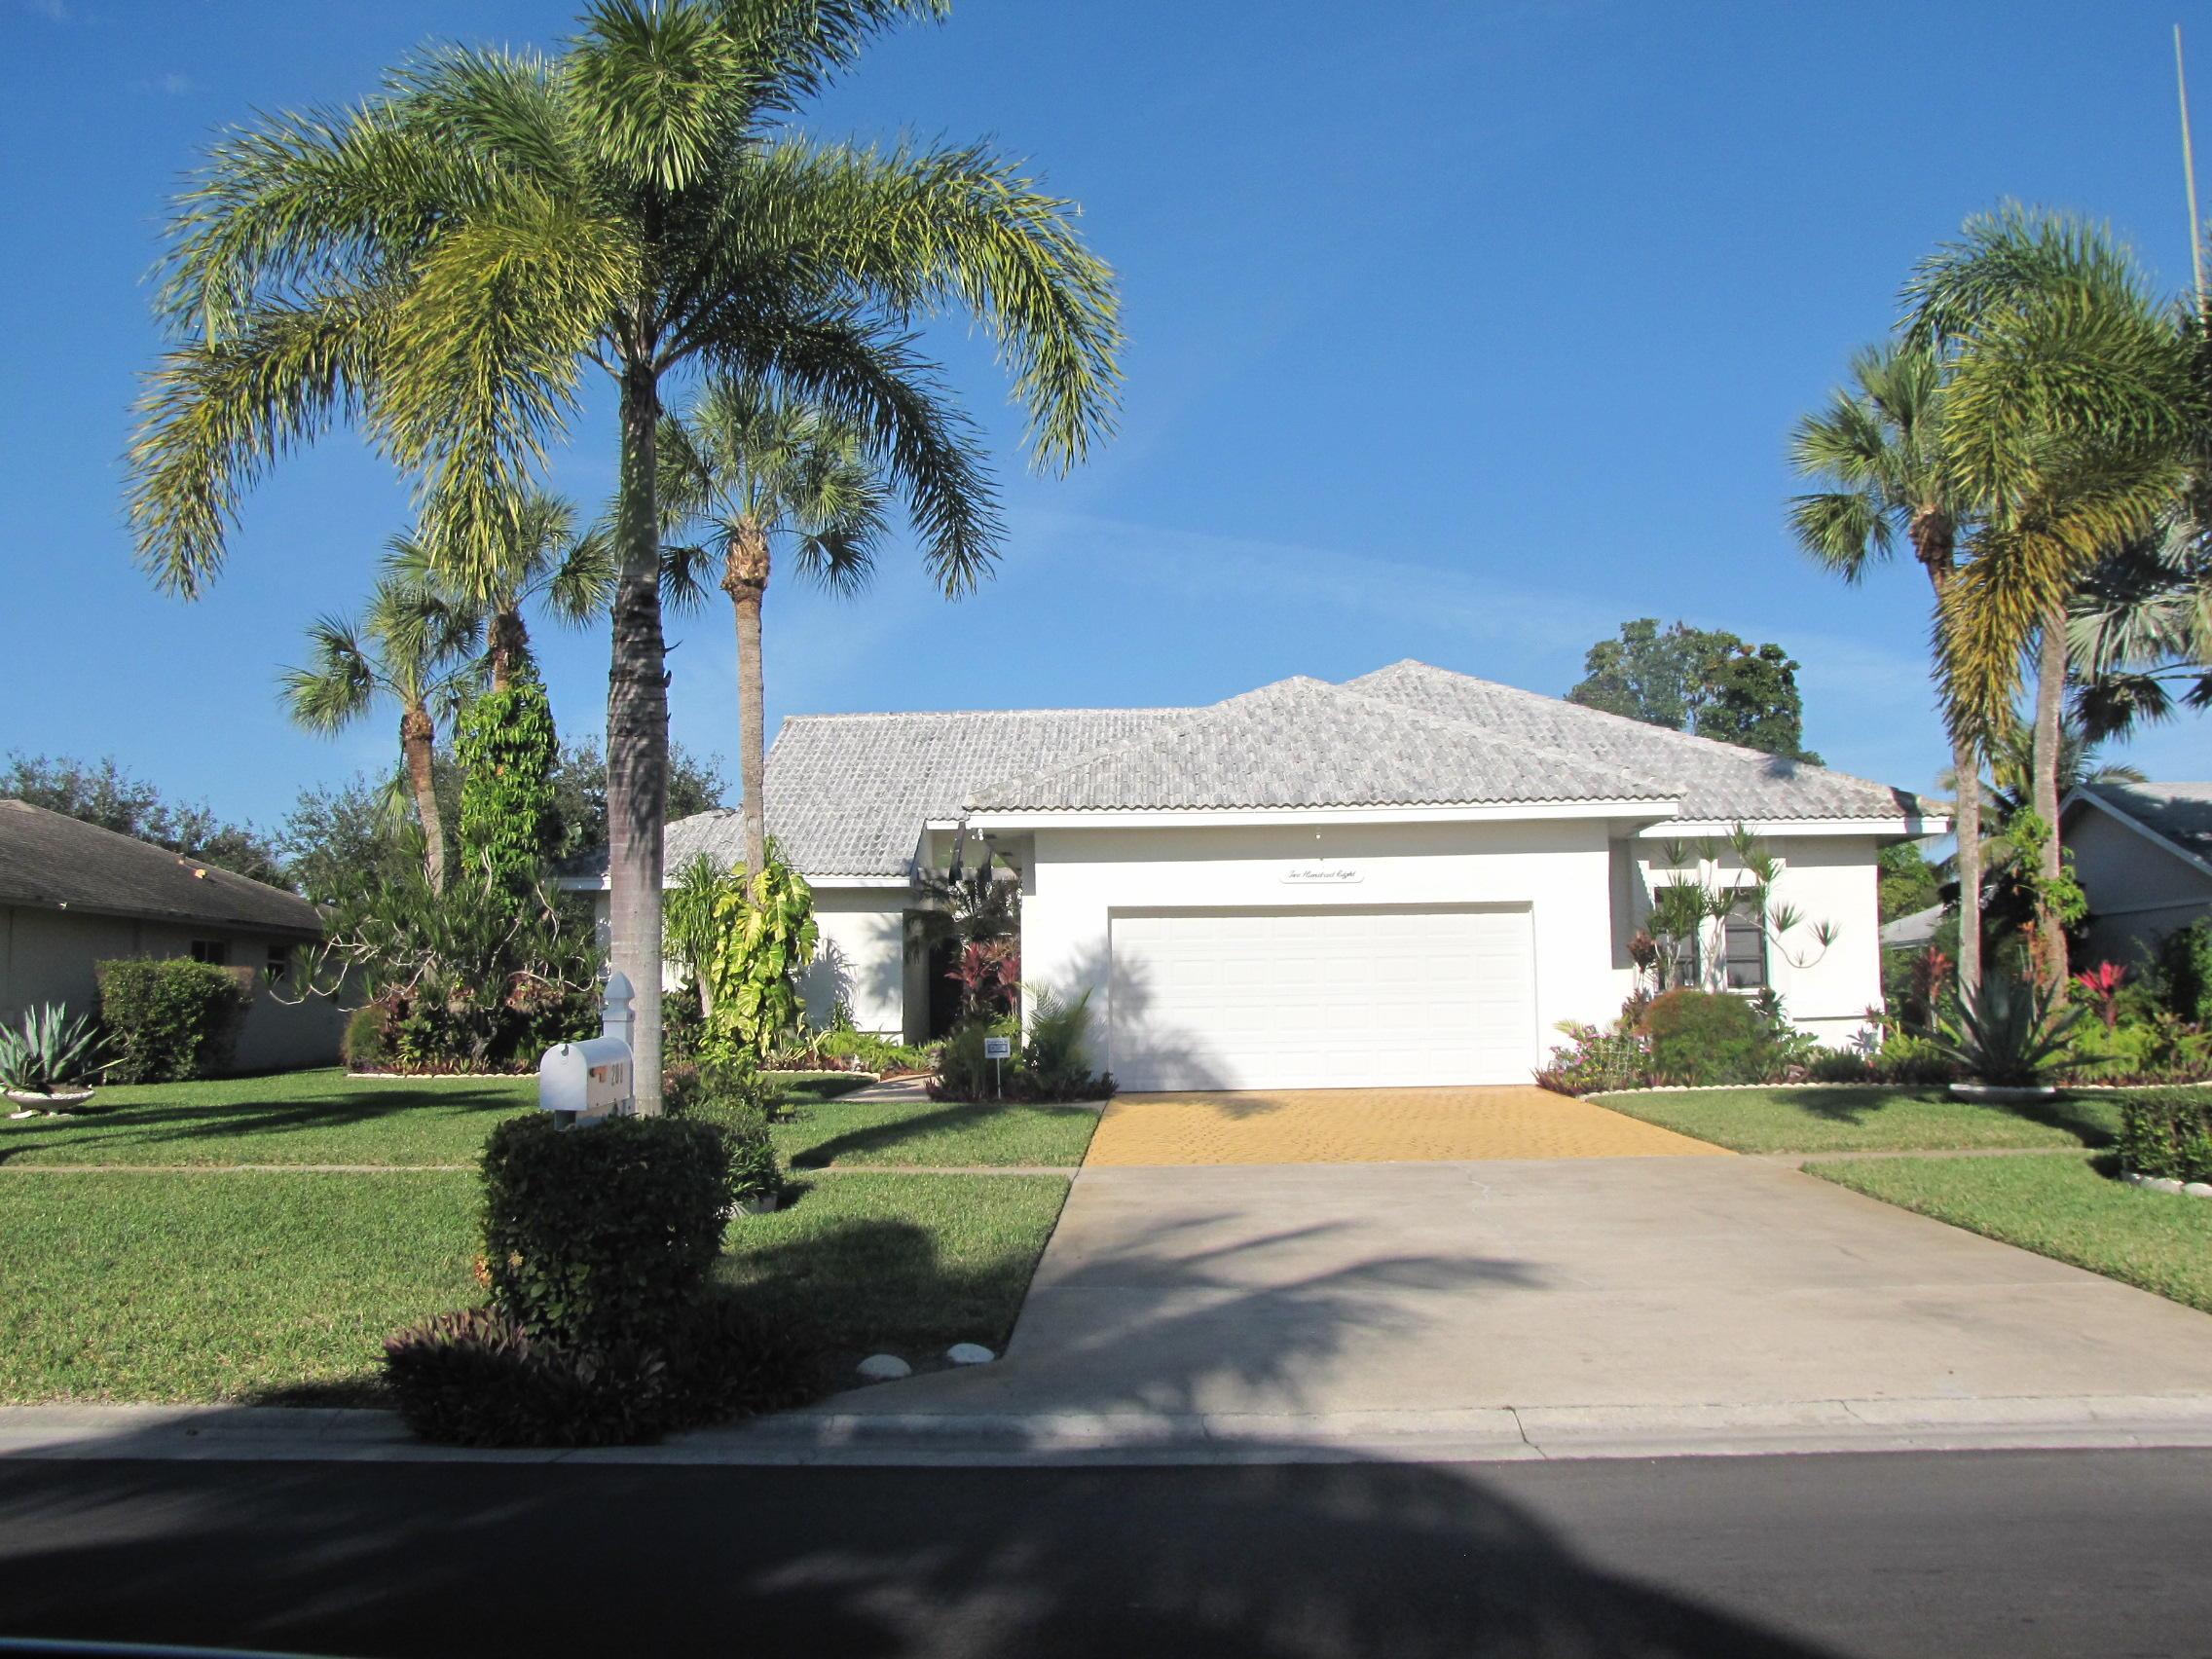 208 Ponce De Leon Street - Royal Palm Beach, Florida